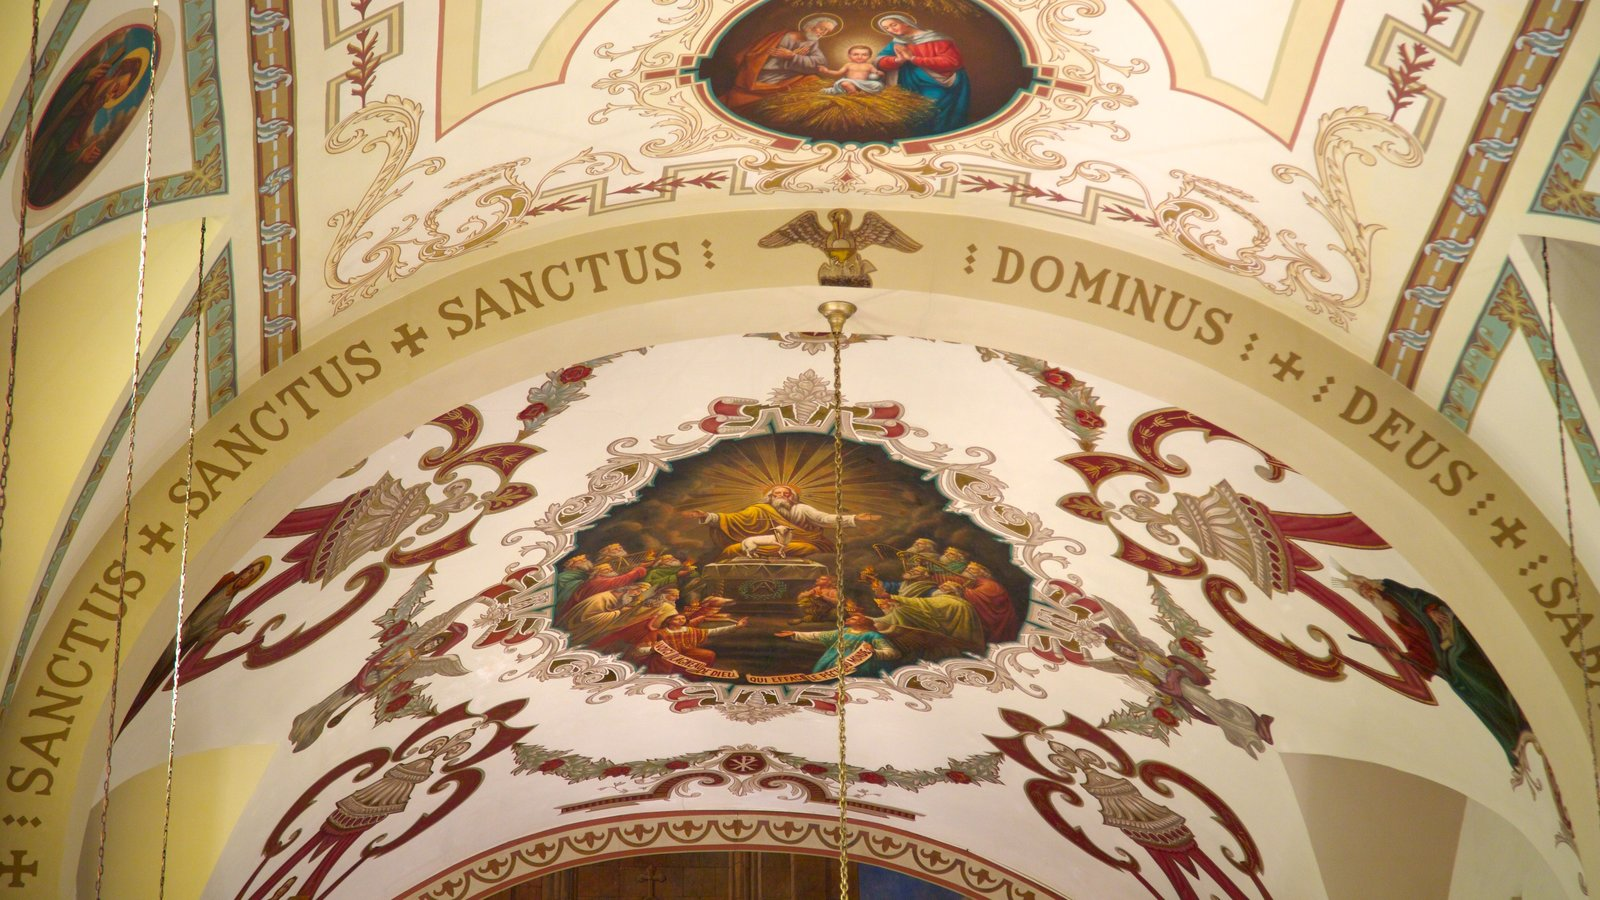 Saint Louis Cathedral caracterizando elementos religiosos, vistas internas e uma igreja ou catedral